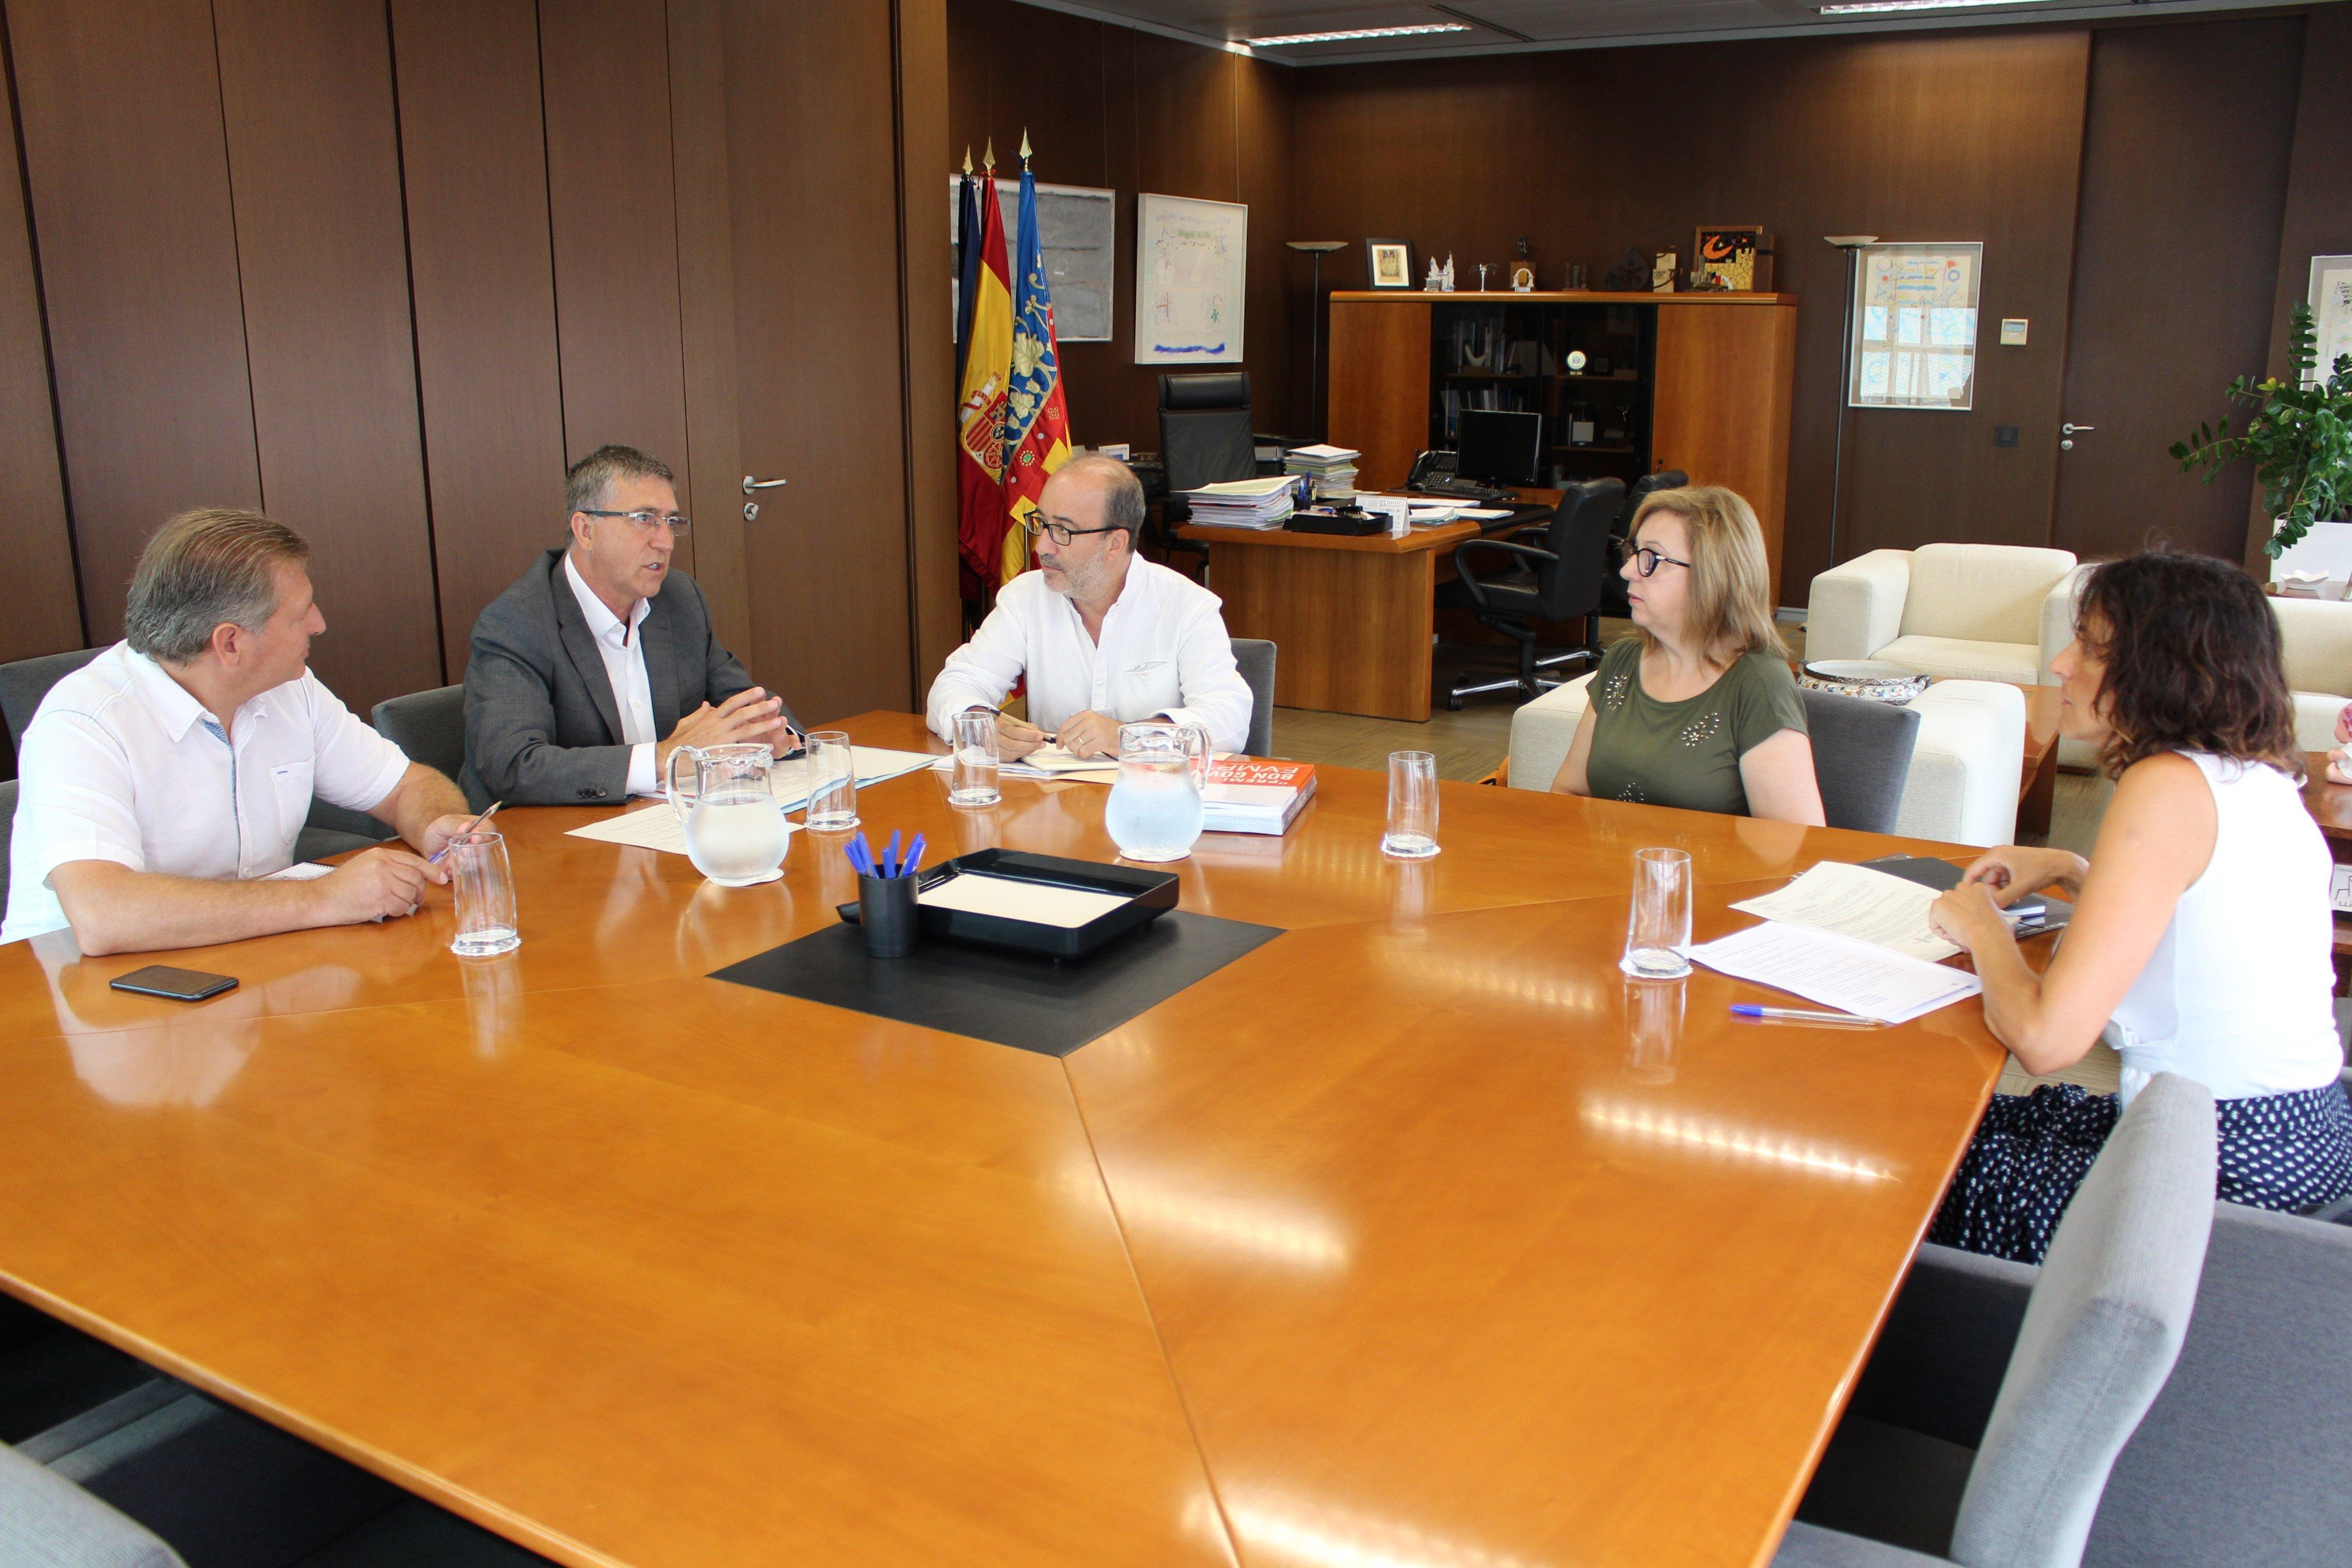 reunio alcaldia conselleria economia - Alzira Radio notícies d'Alzira